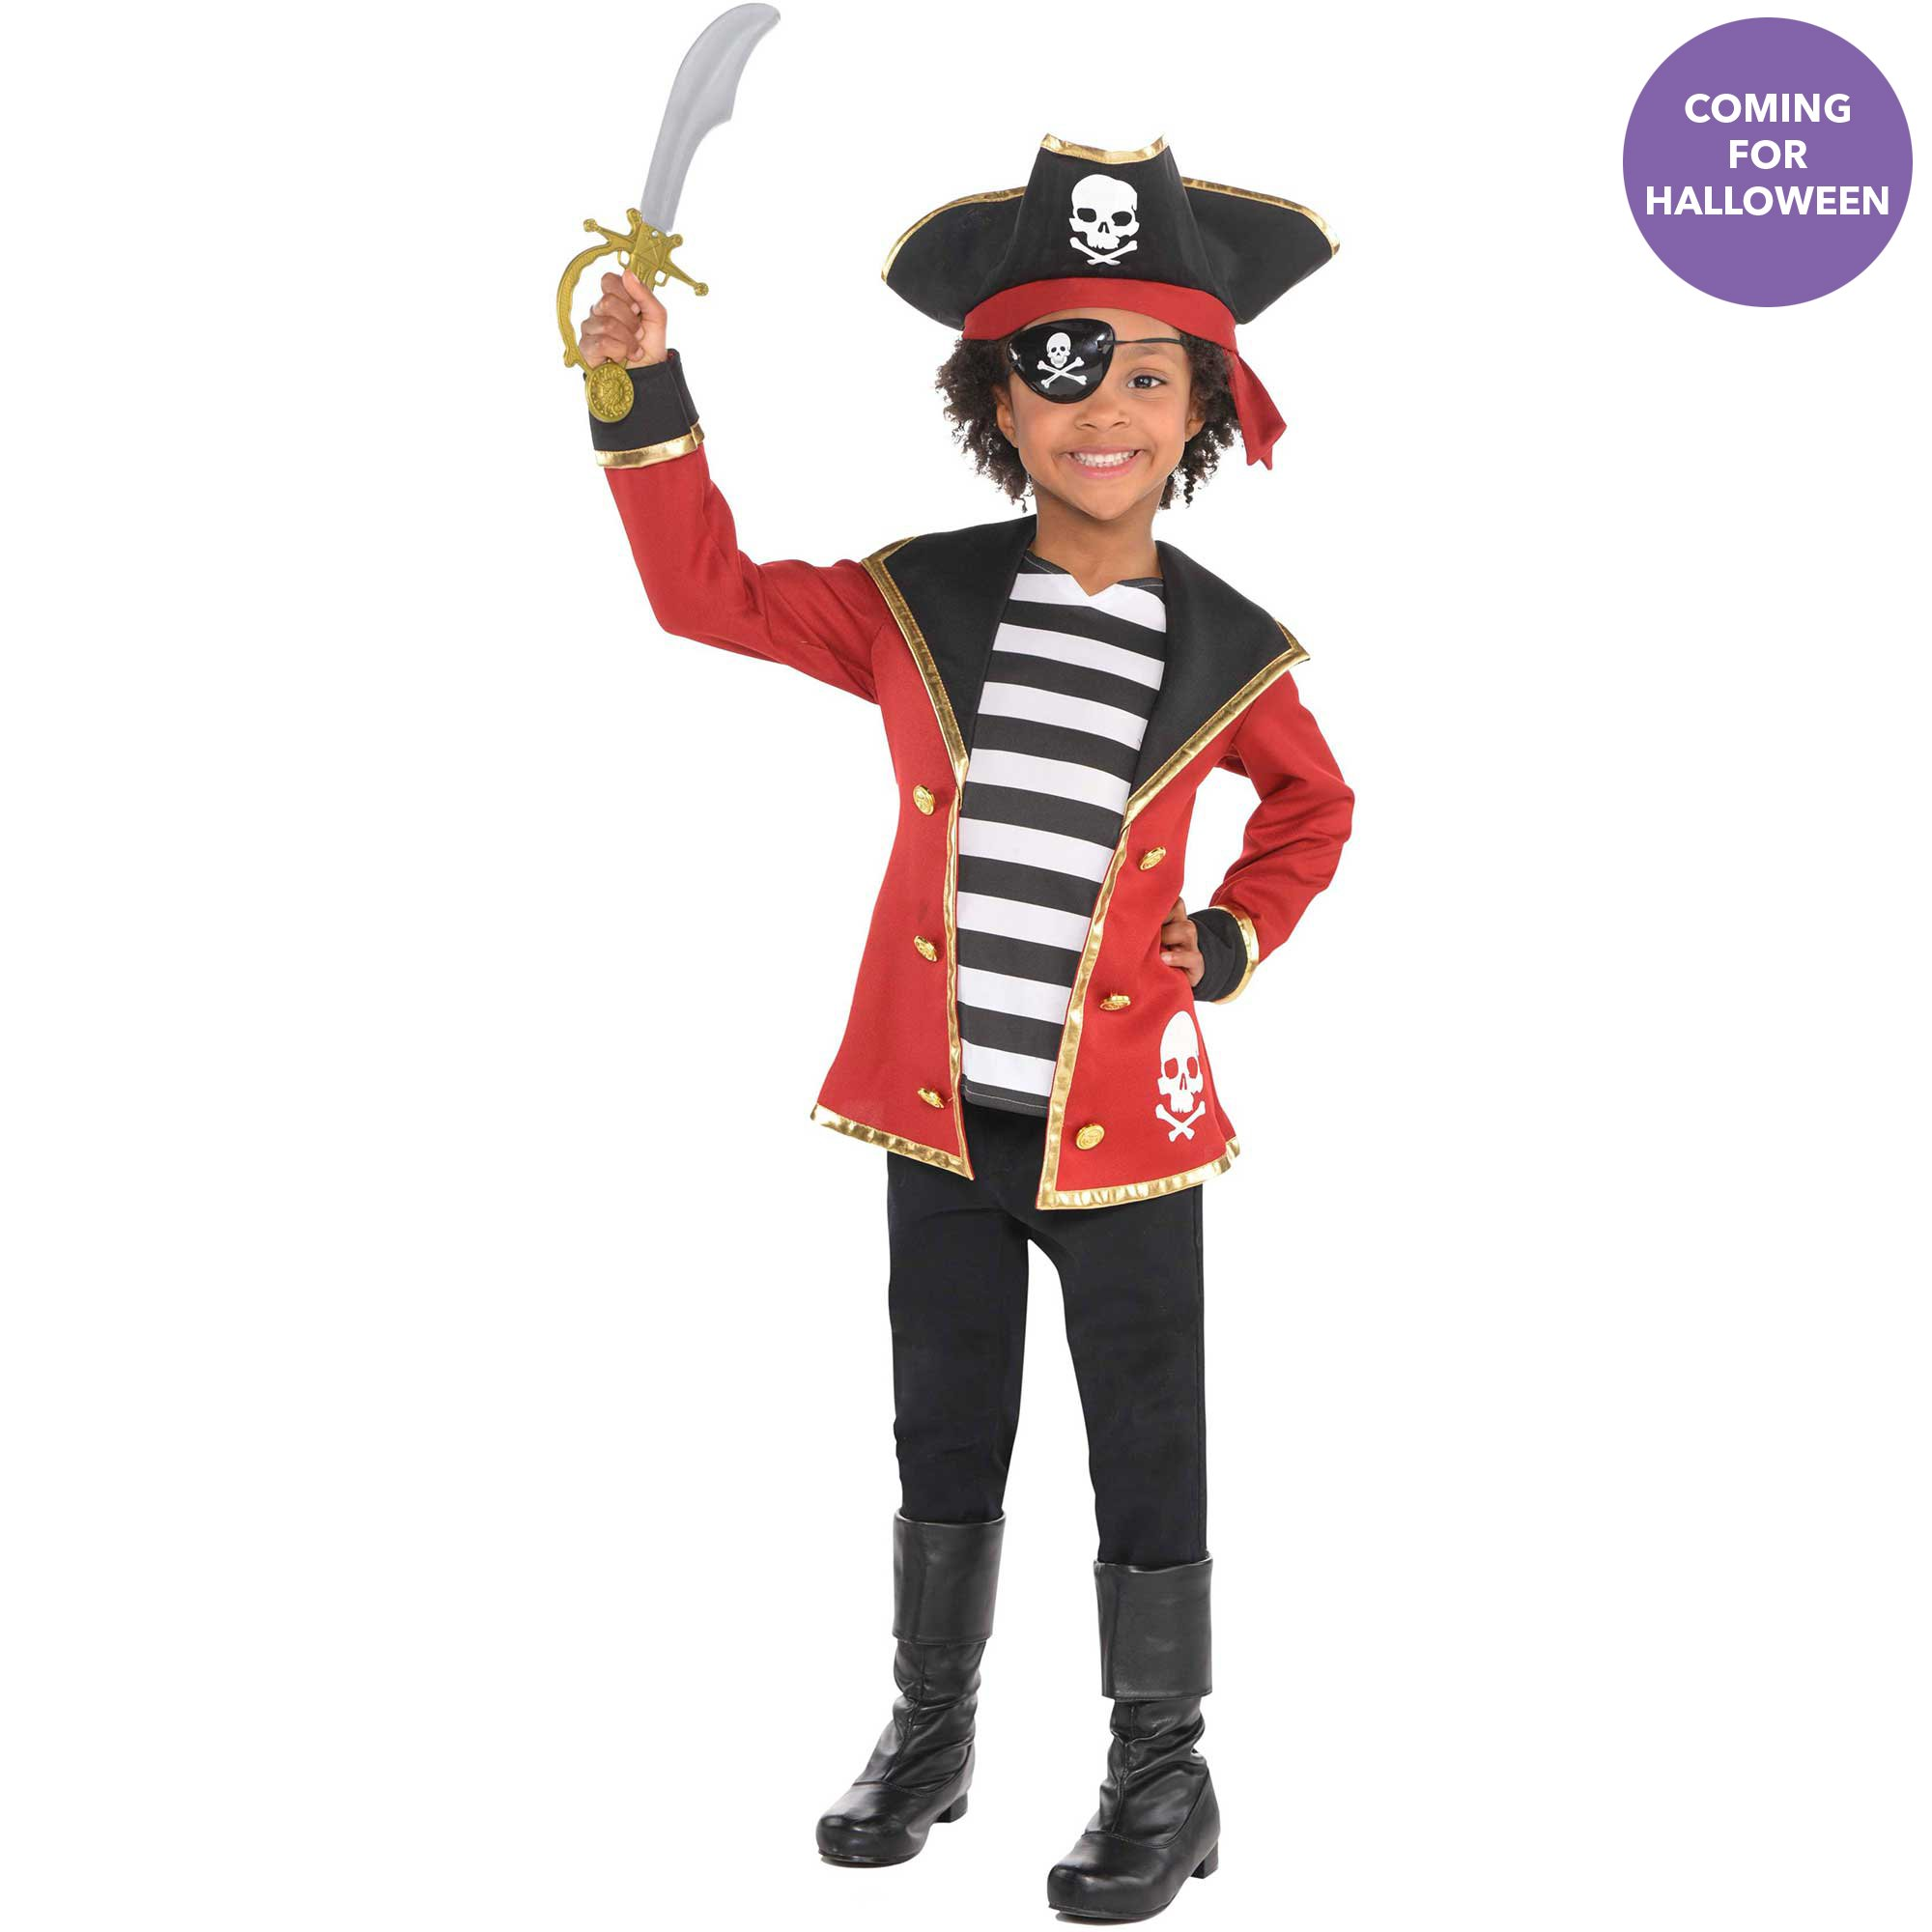 Childs Pirate Costume Kit Small 4-6 yrs